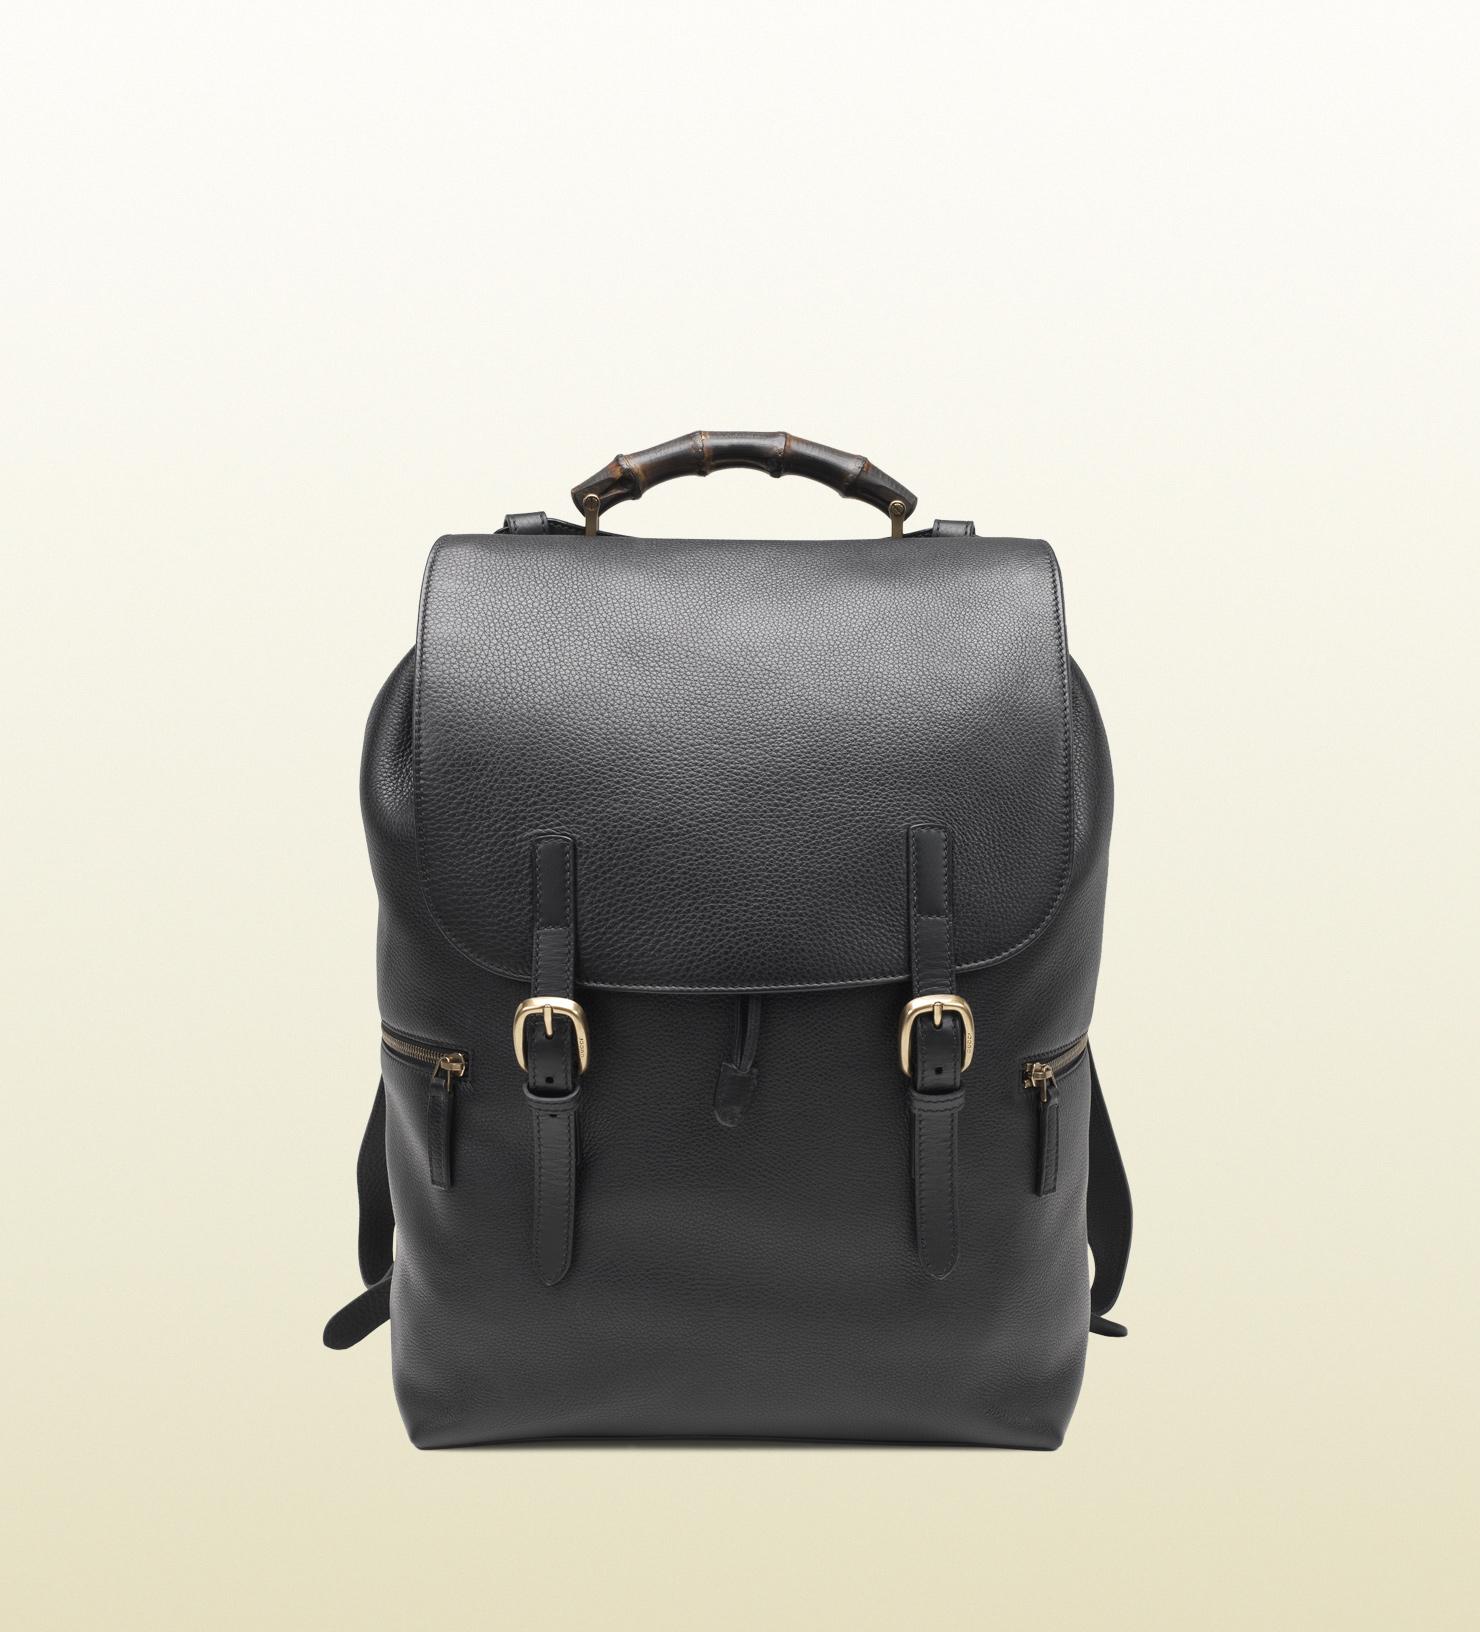 d6a4272d6 Gucci Black Leather Backpack in Black for Men - Lyst